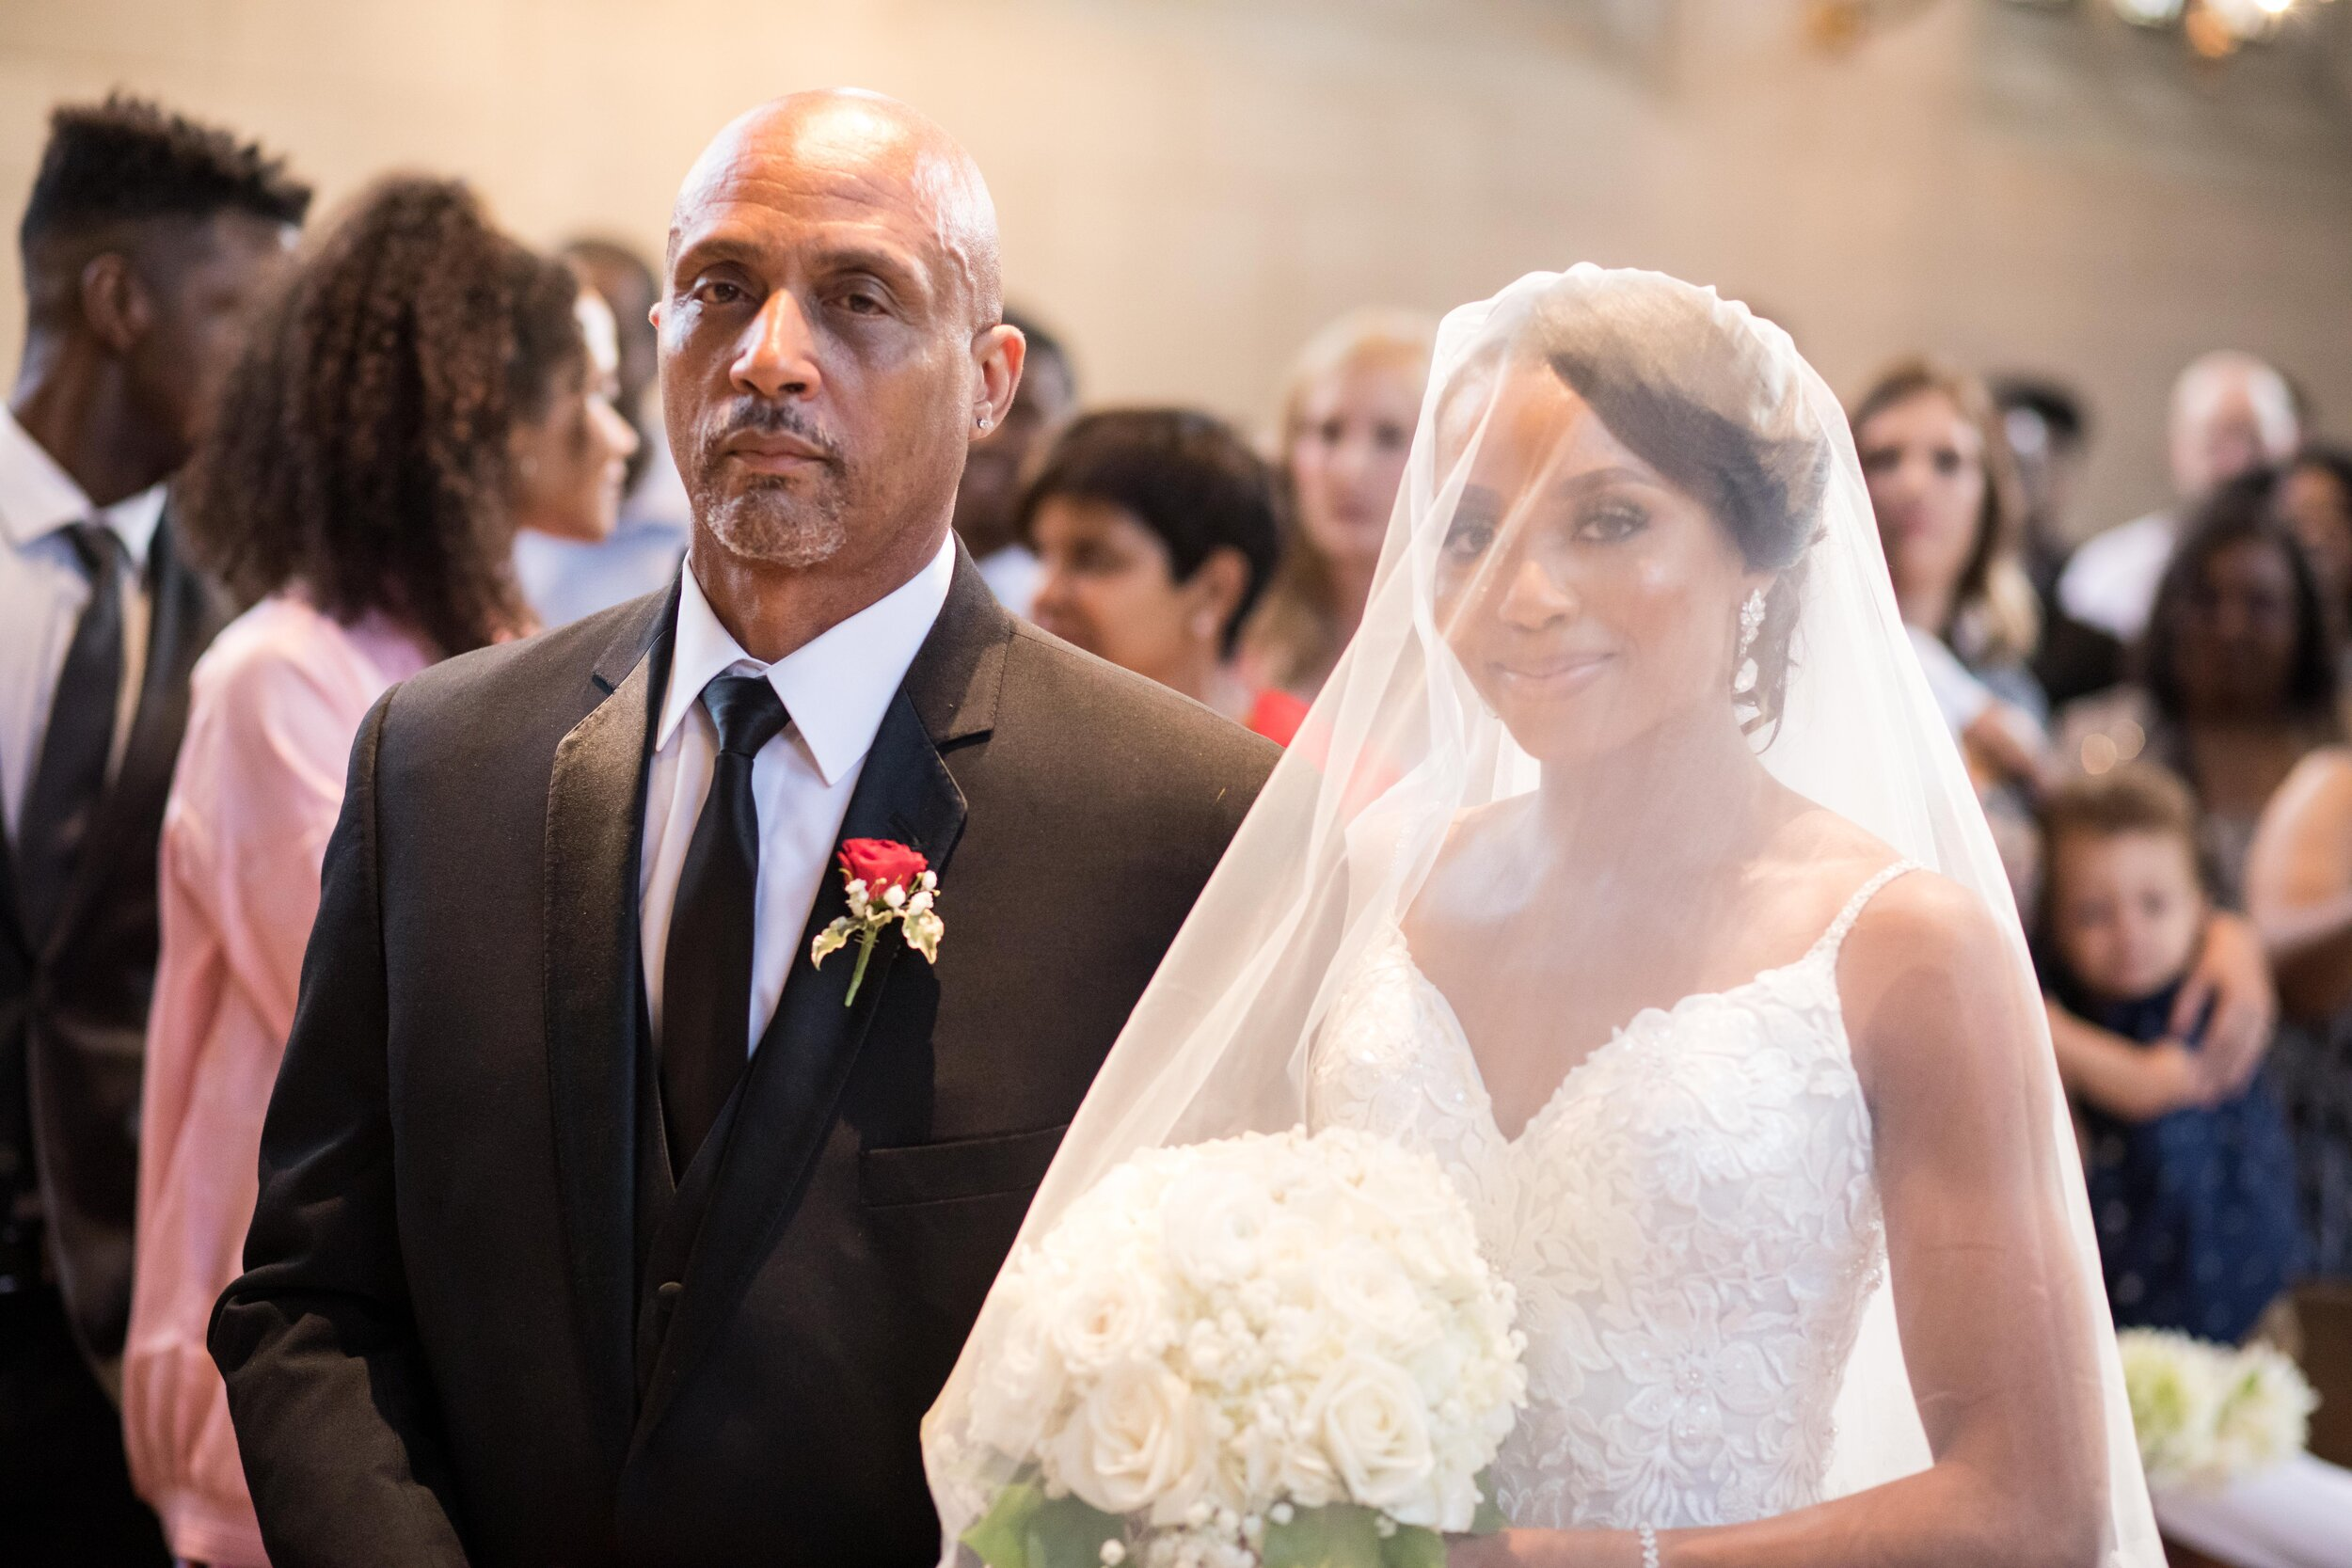 8_3_2019_BONTY_WEDDING-319.jpg